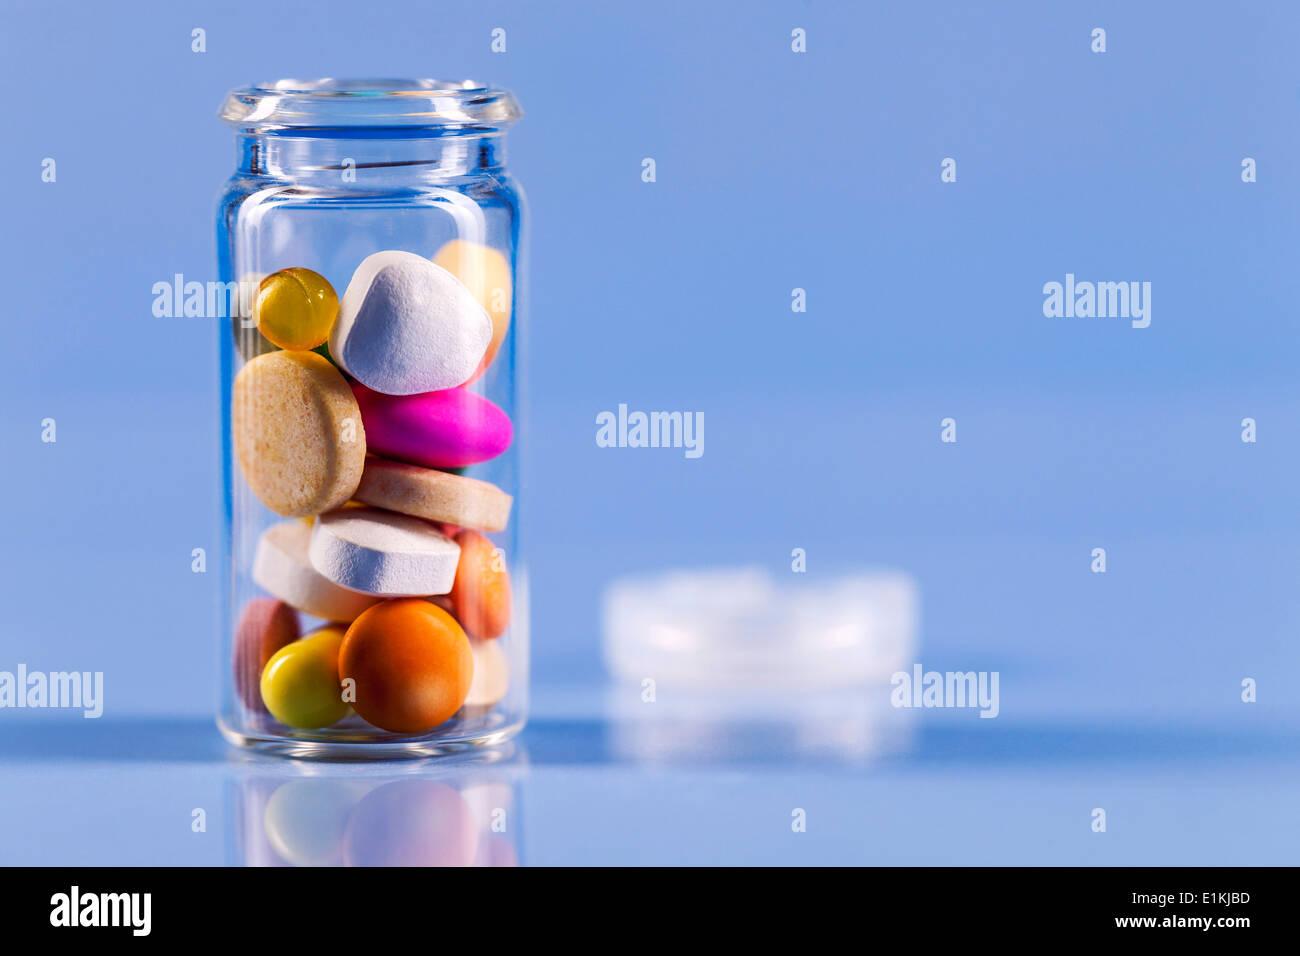 Pills and open bottle studio shot. - Stock Image